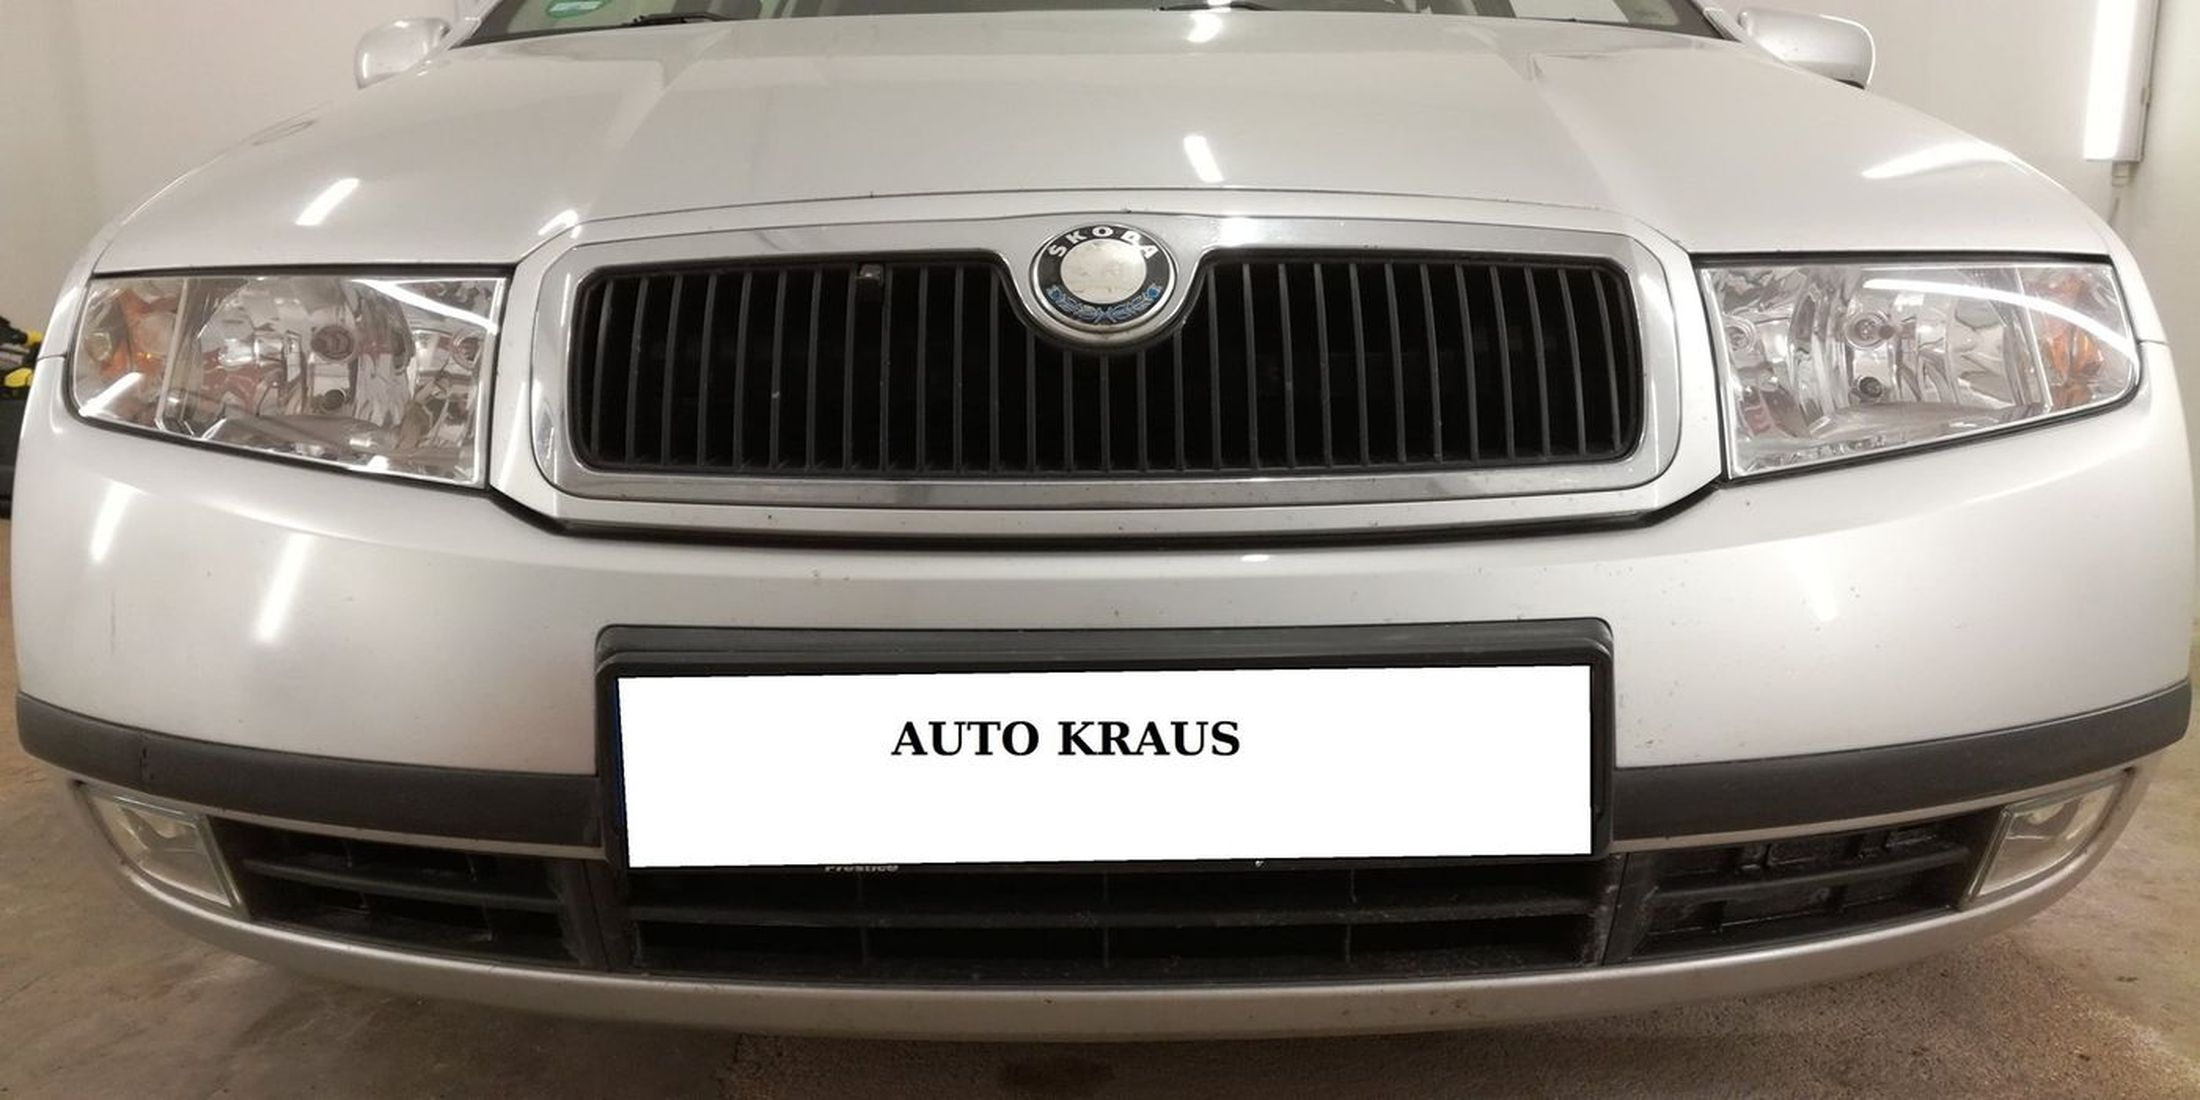 Detailing – Auto Kraus Garage Plzeň – Jih - Renovace-světlometů